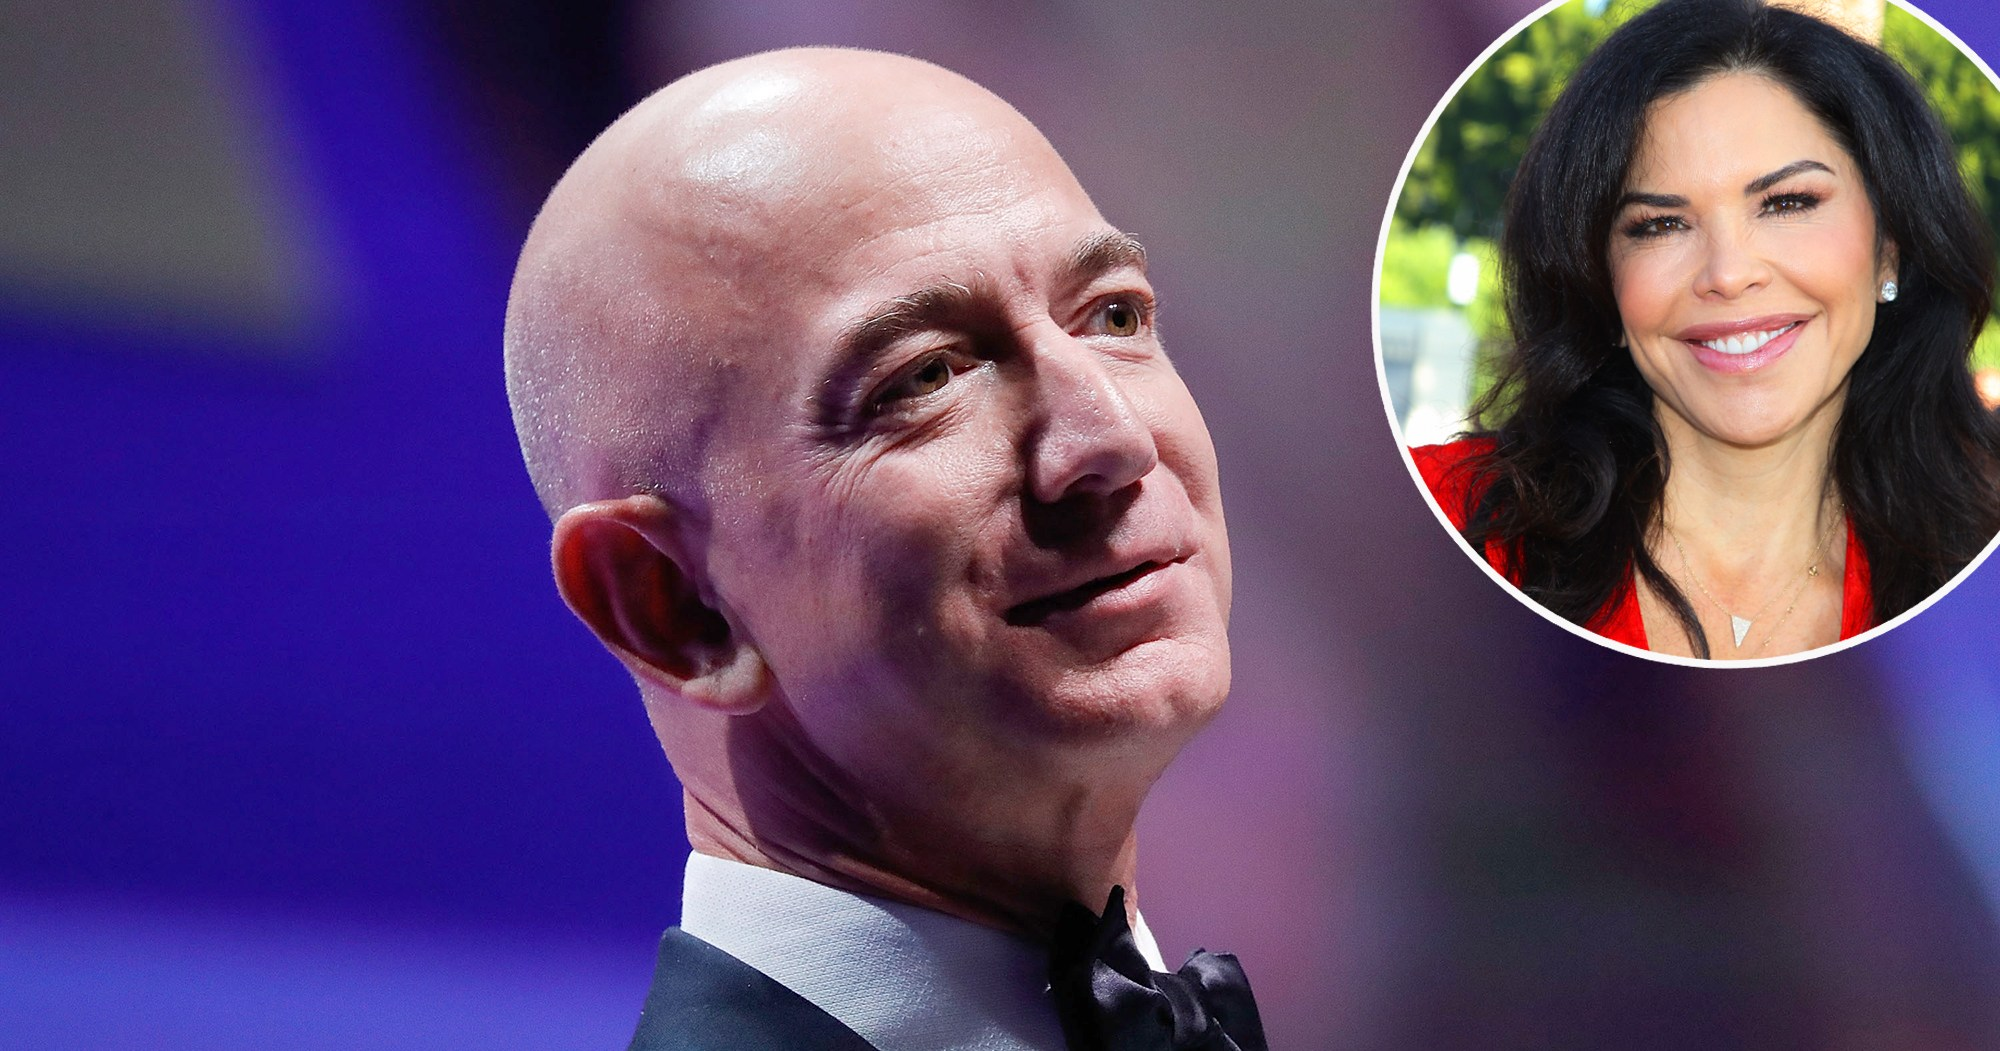 Jeff Bezos' Affair With Lauren Sanchez Has Been a Professional Nightmare for Him